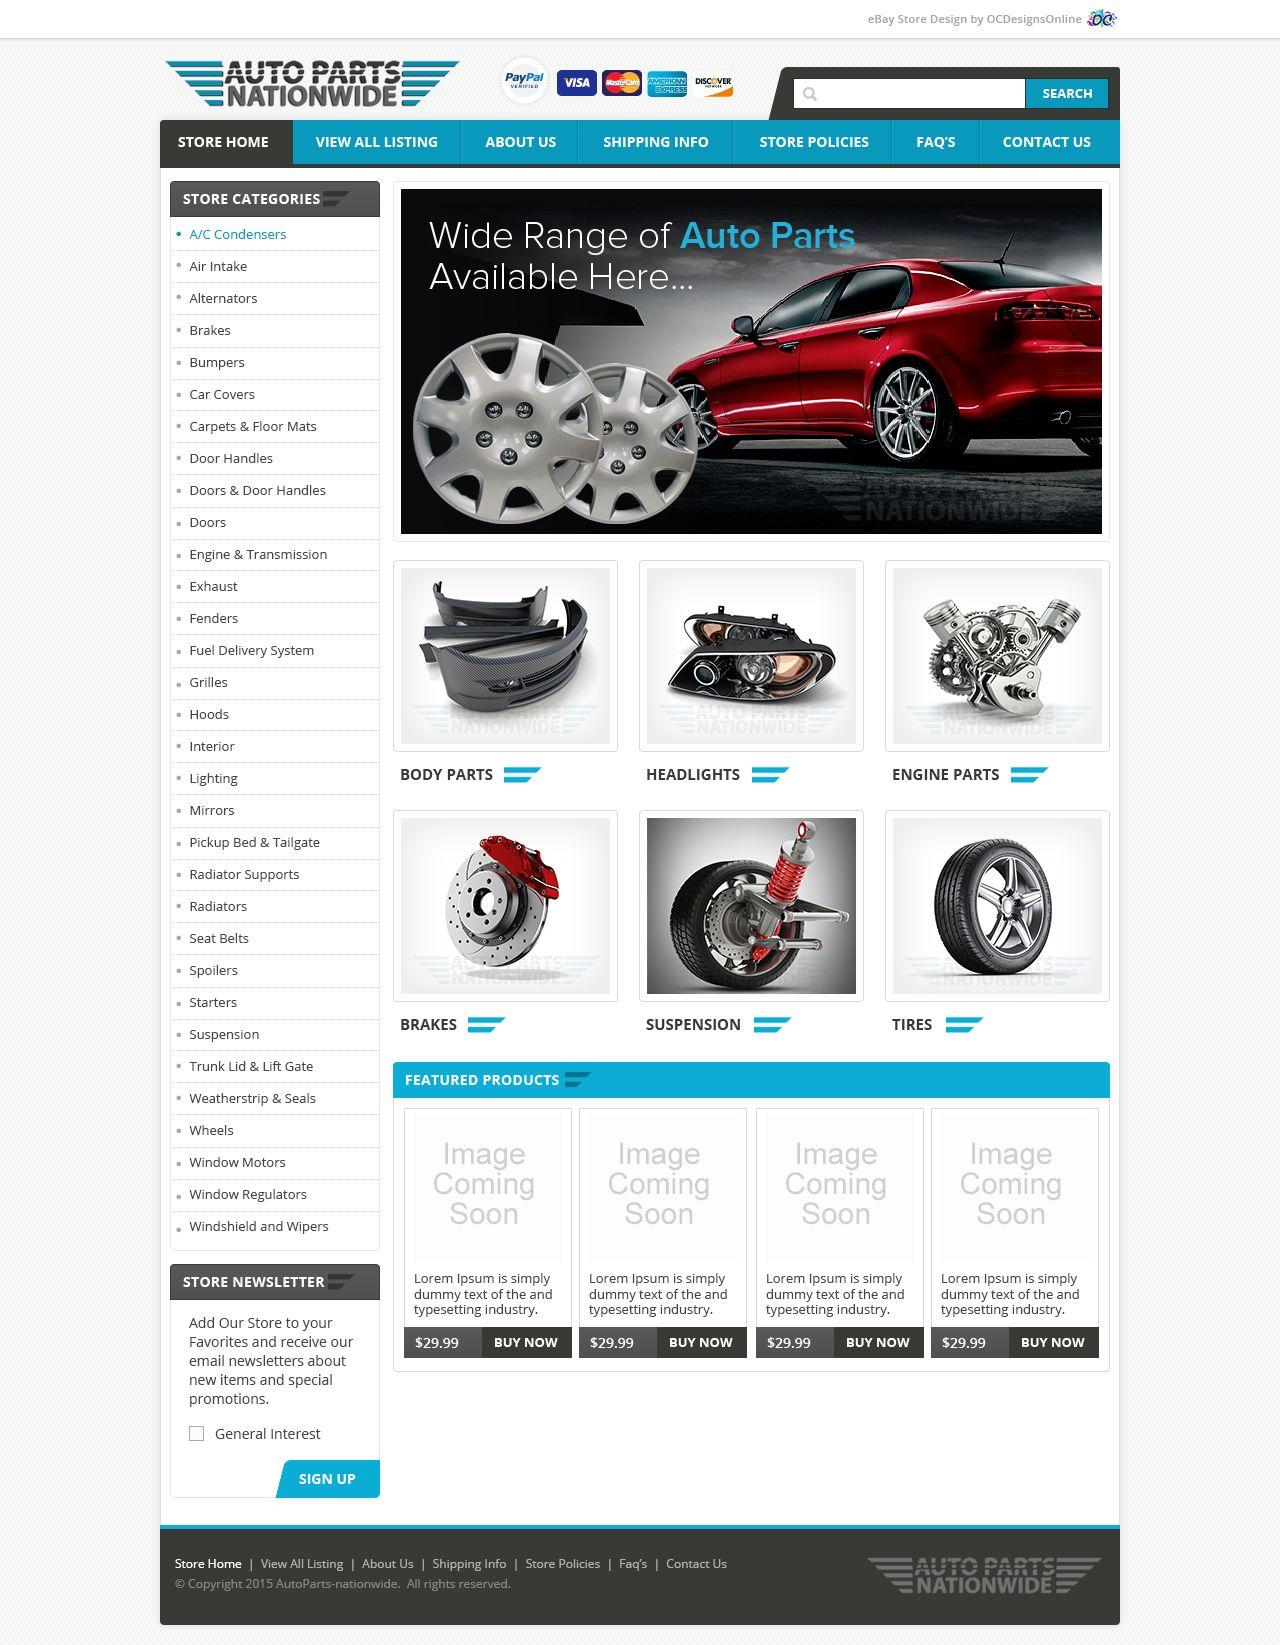 Custom Ebay Store Design For Autoparts Nationwide Ebay Store Design Email Design Website Design